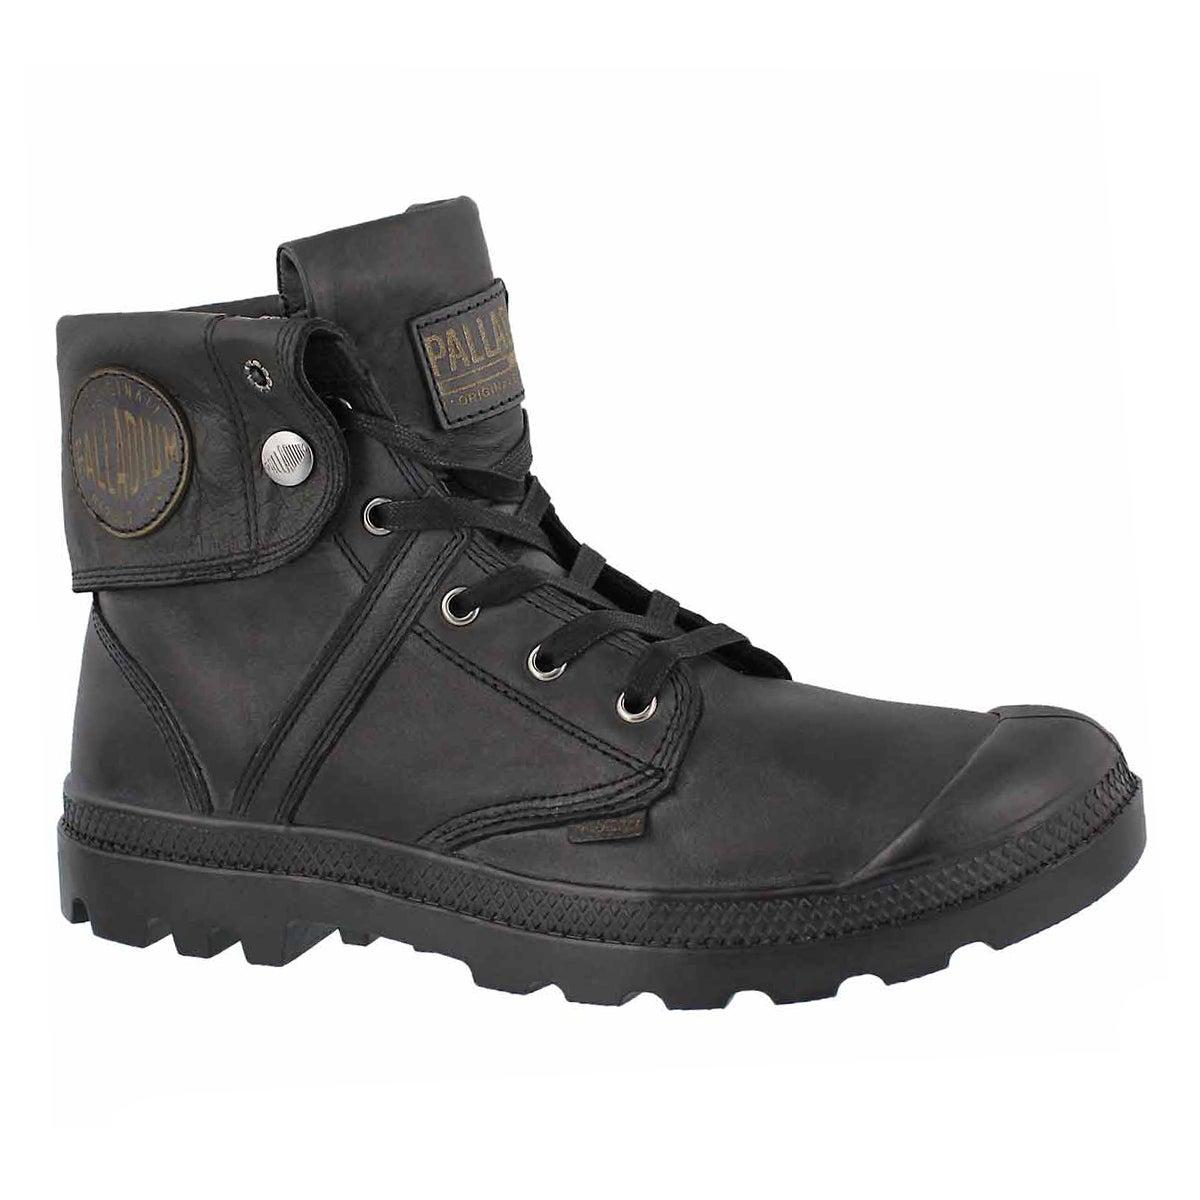 Men's PALLABROUSE BAGGY L2 black ankle boots